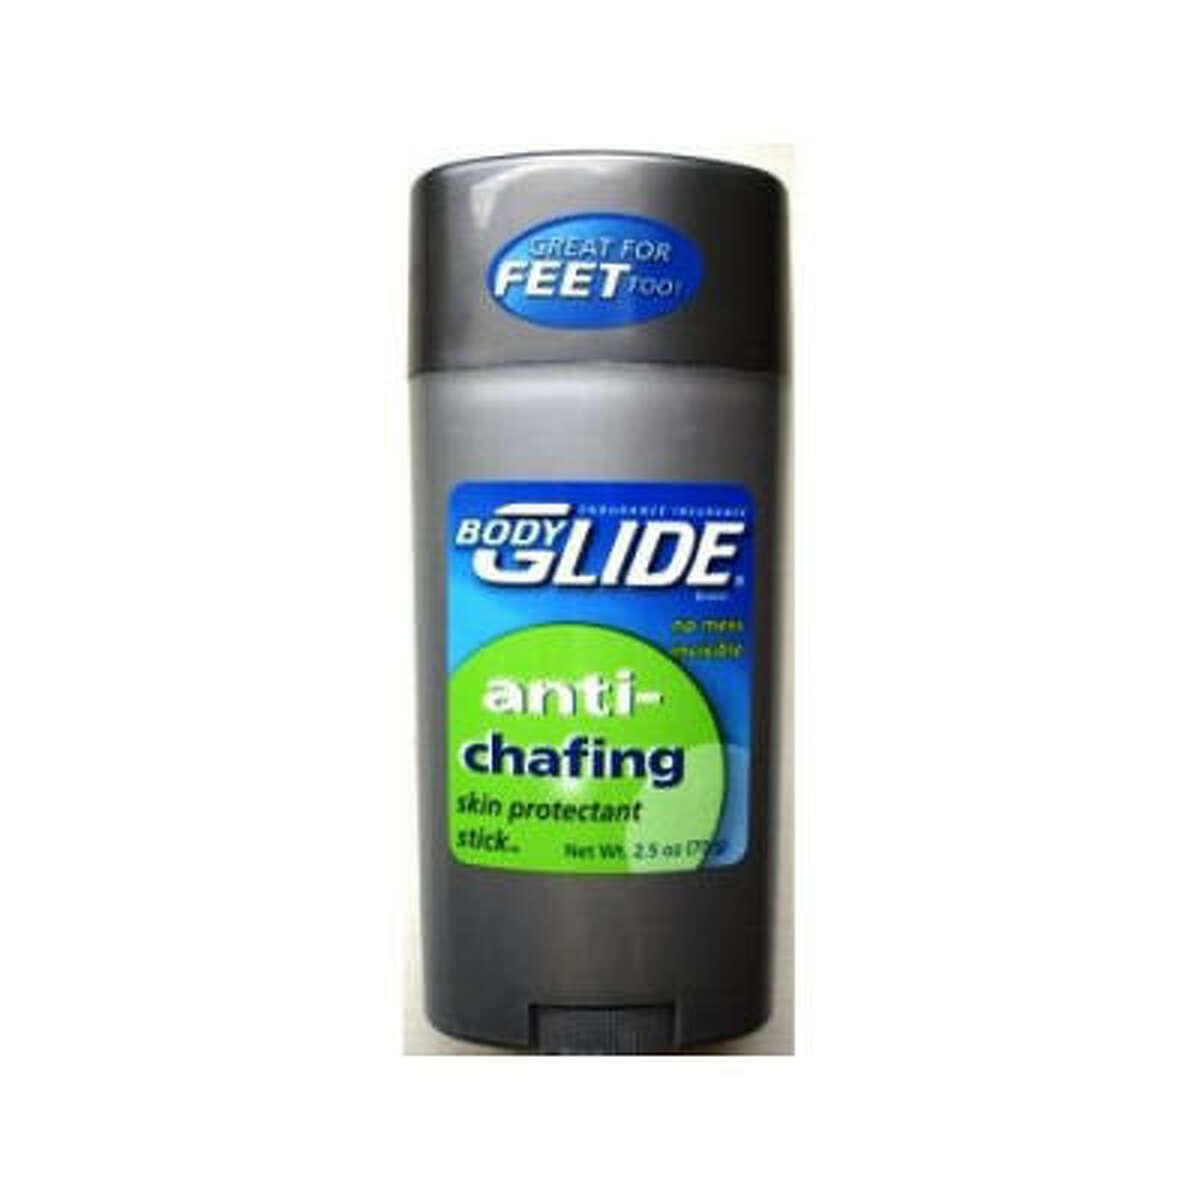 Body Glide moisturizer, $14.99, Sun & Ski Sports